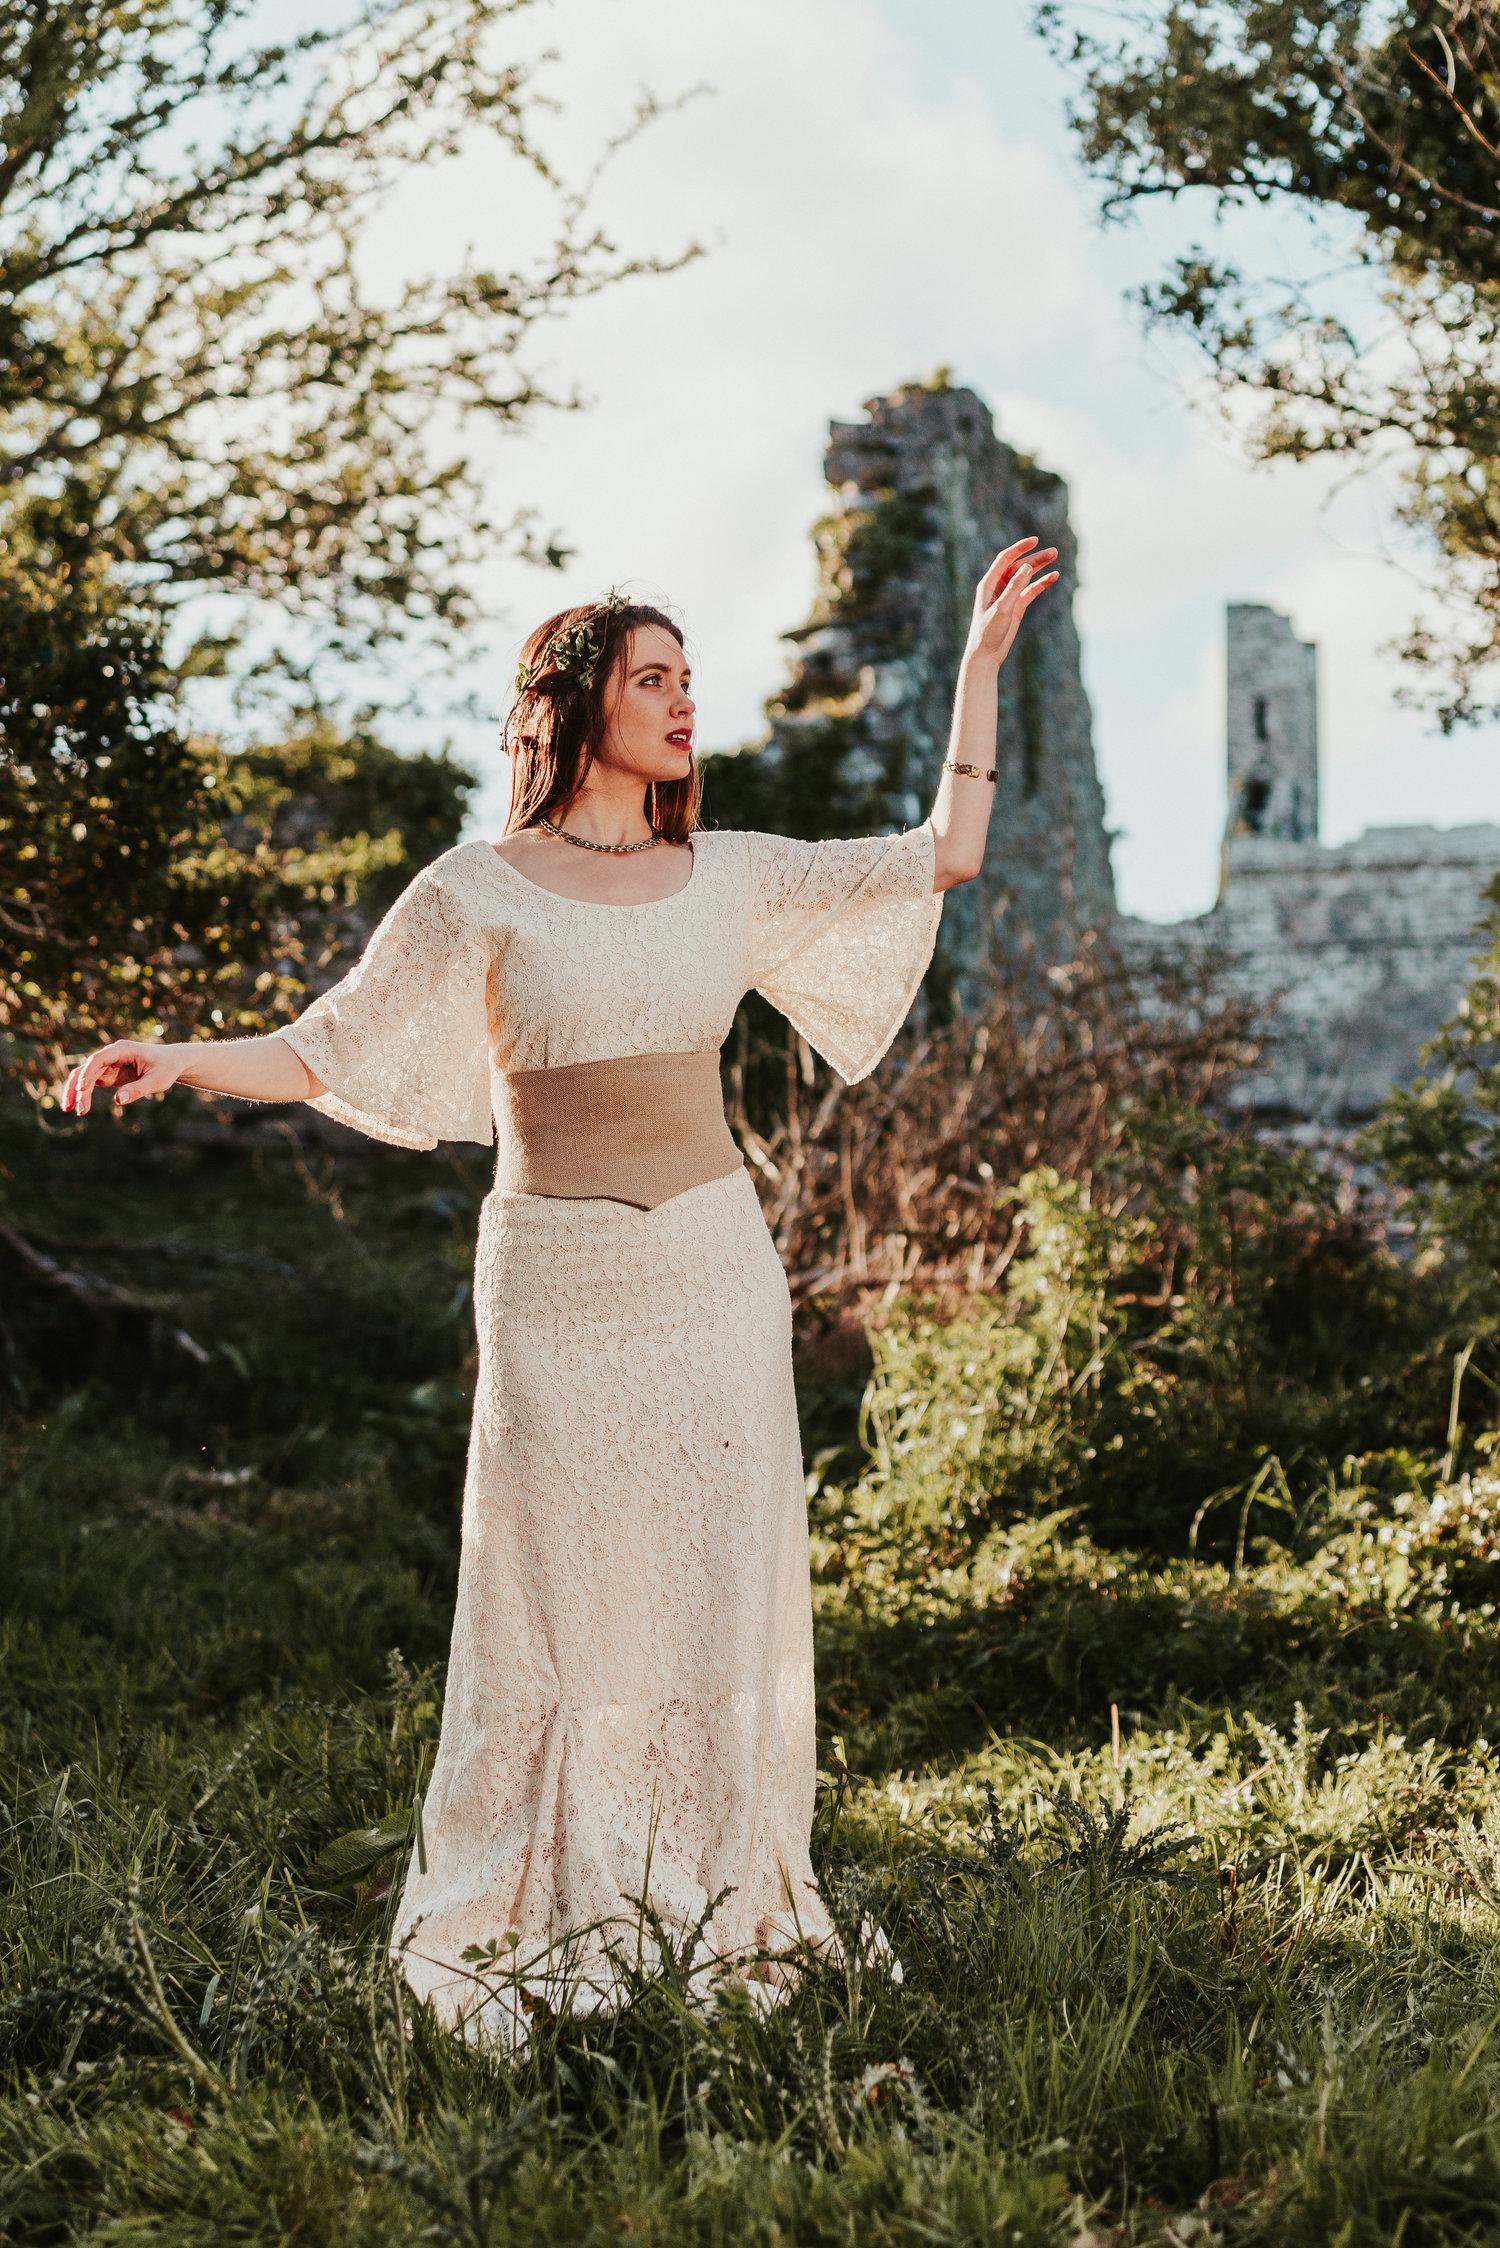 Eadon Corsetted Wedding Dress Free Spirit Pagan Clothing,Sparkle Glitter Tulle Wedding Dress